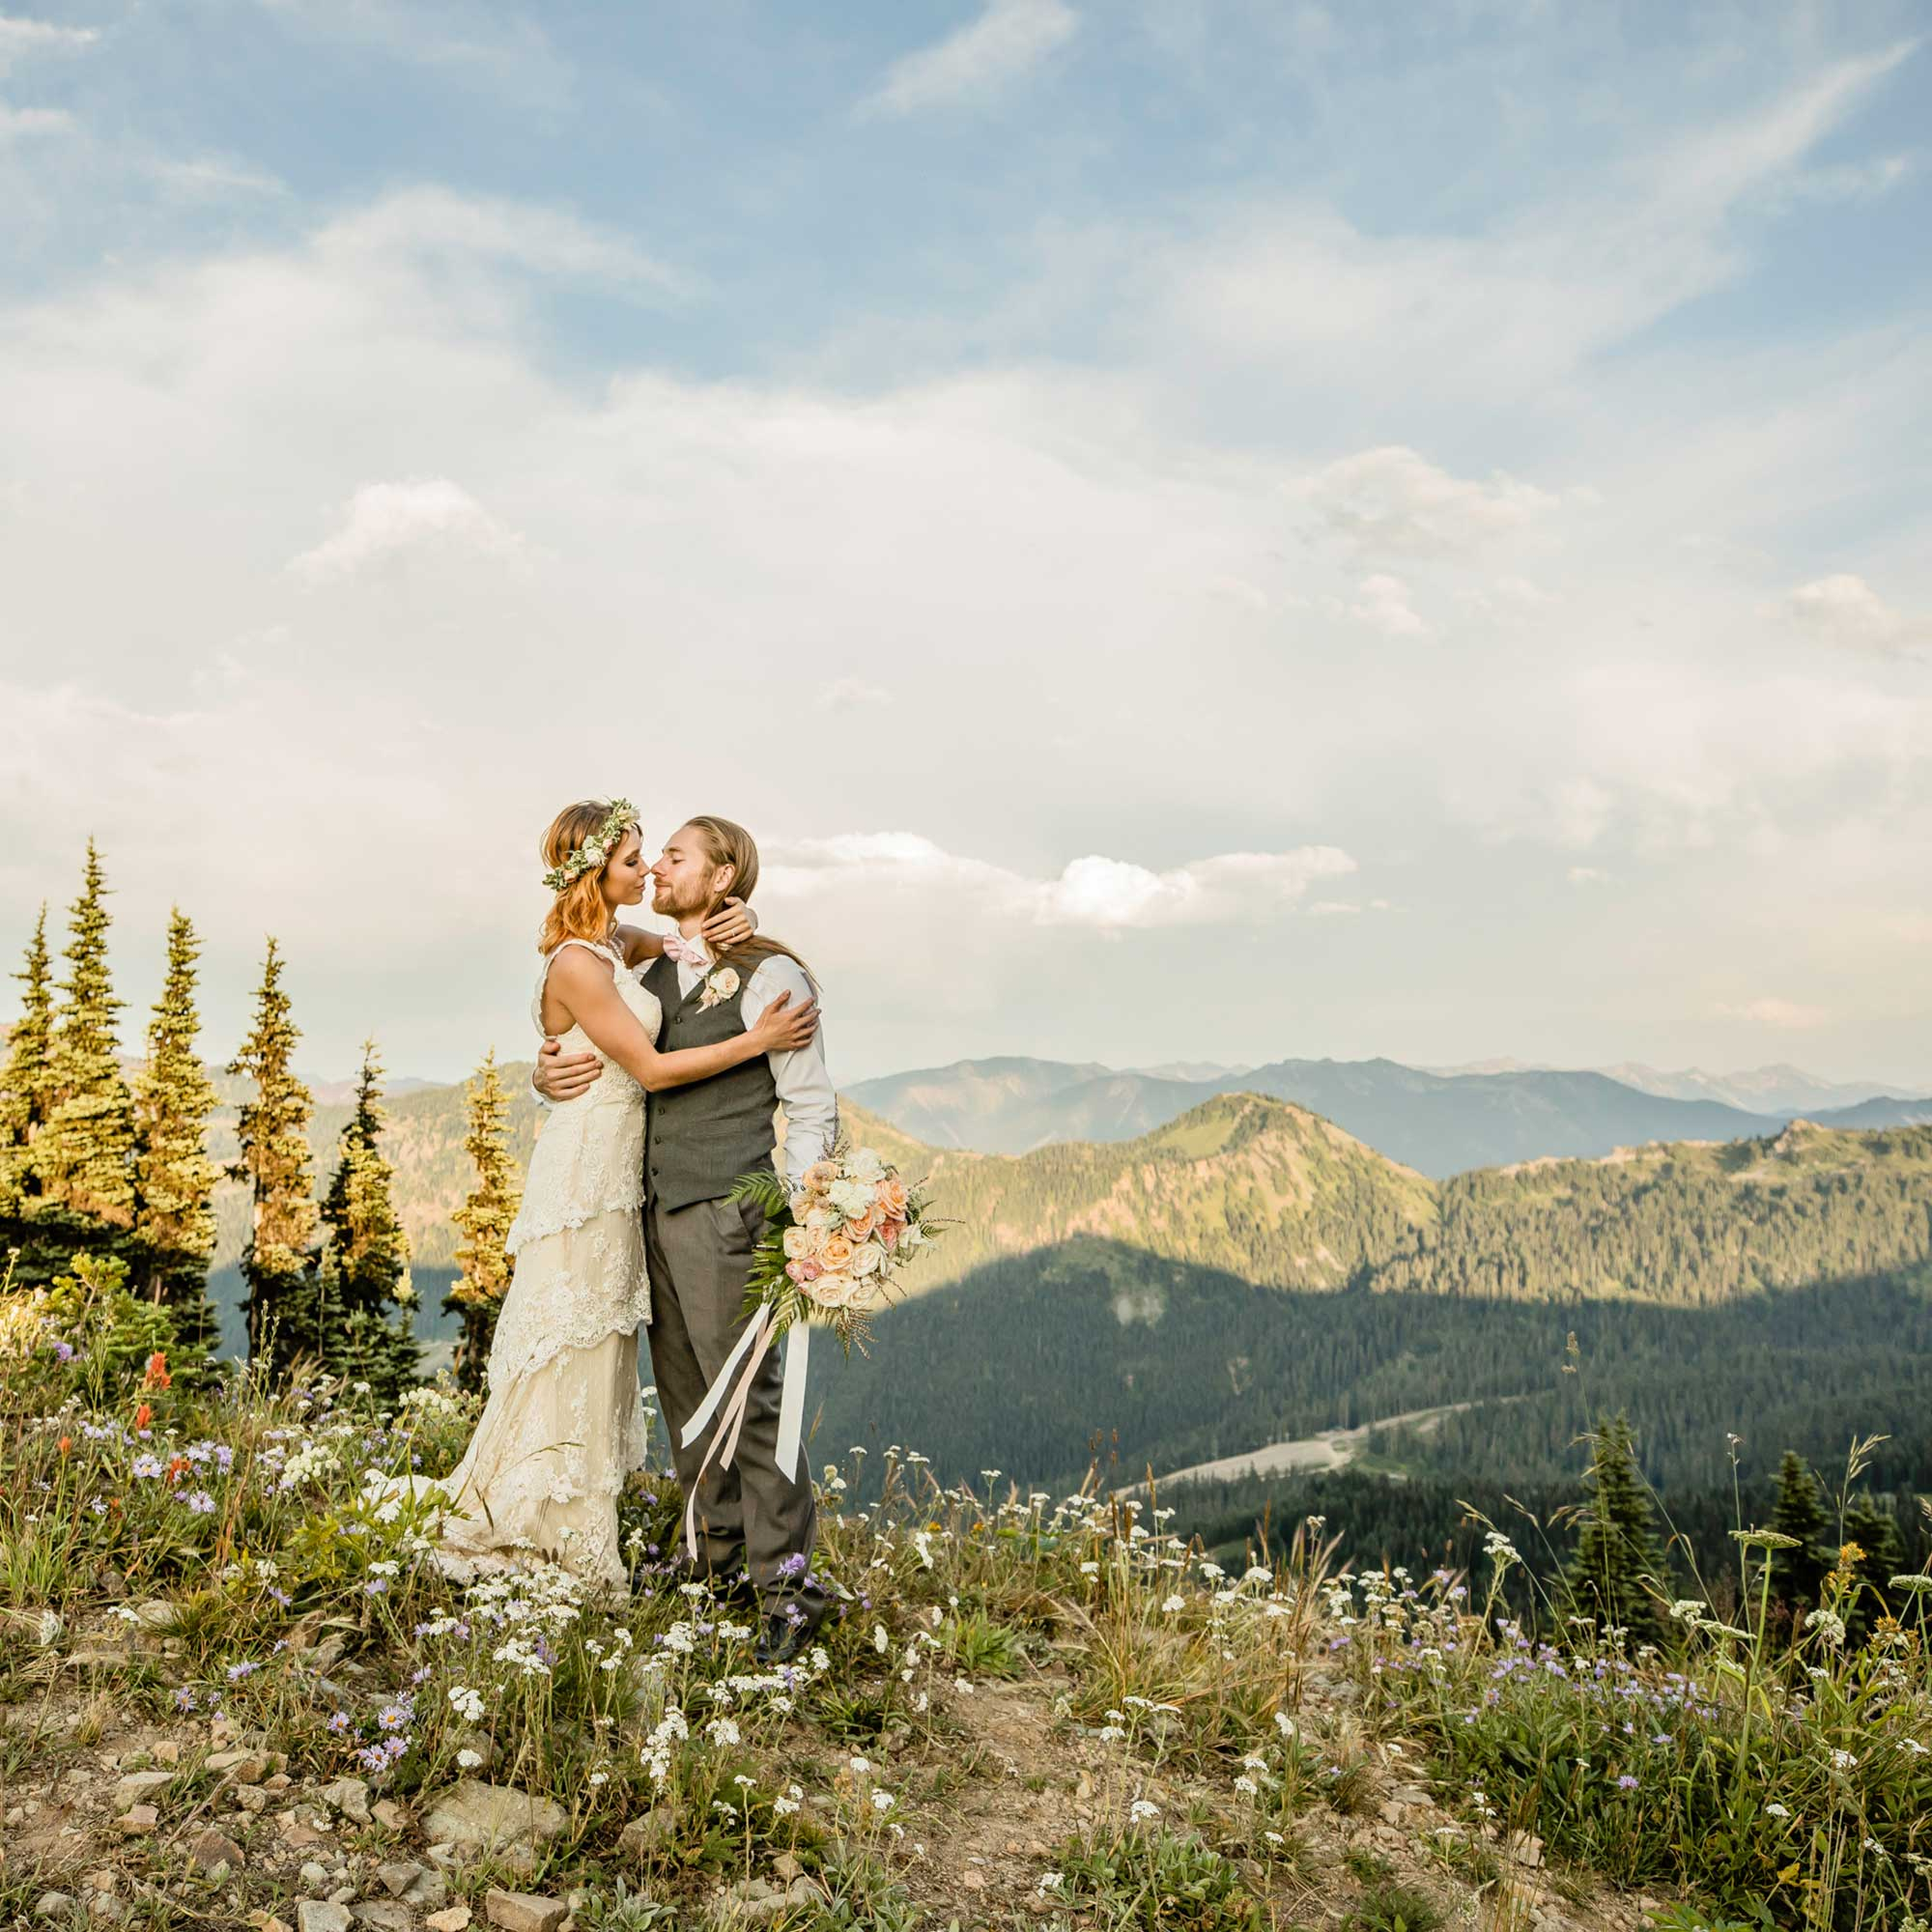 Wedding with wildflowers